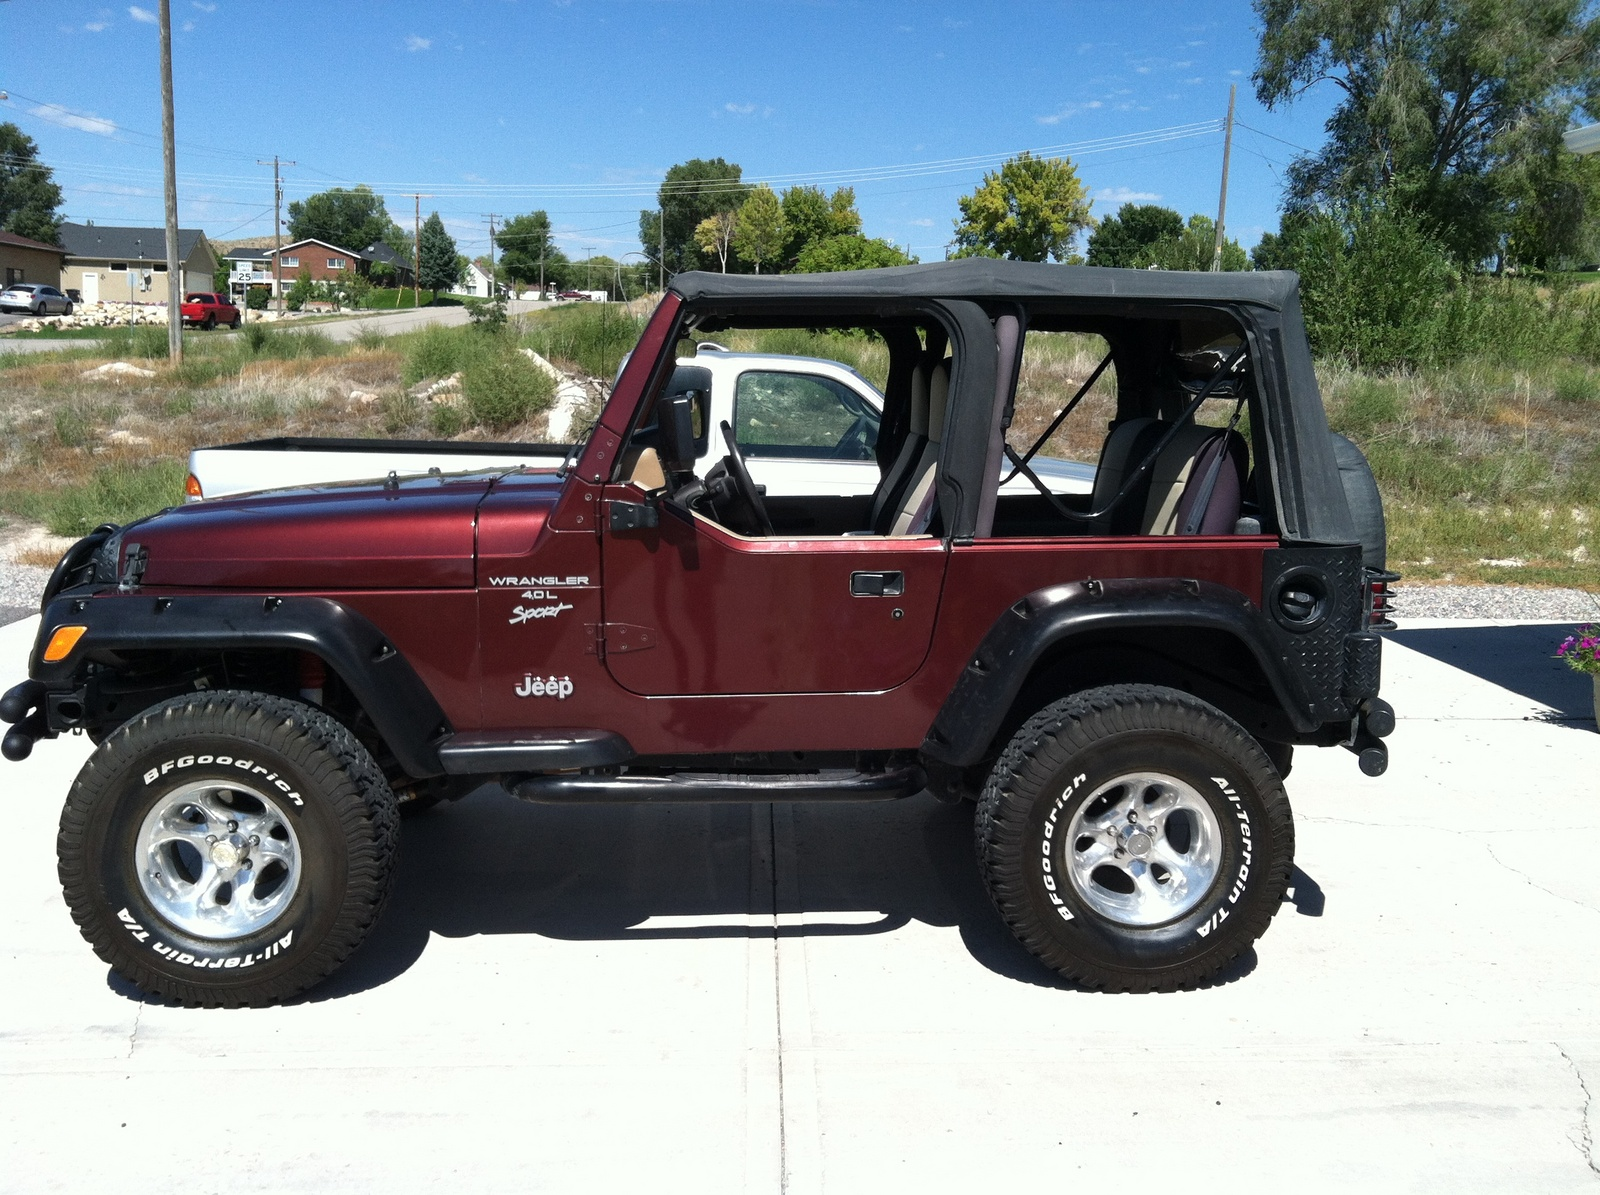 1997 Jeep Wrangler Se 2001 Jeep Wrangler - Pictures - CarGurus